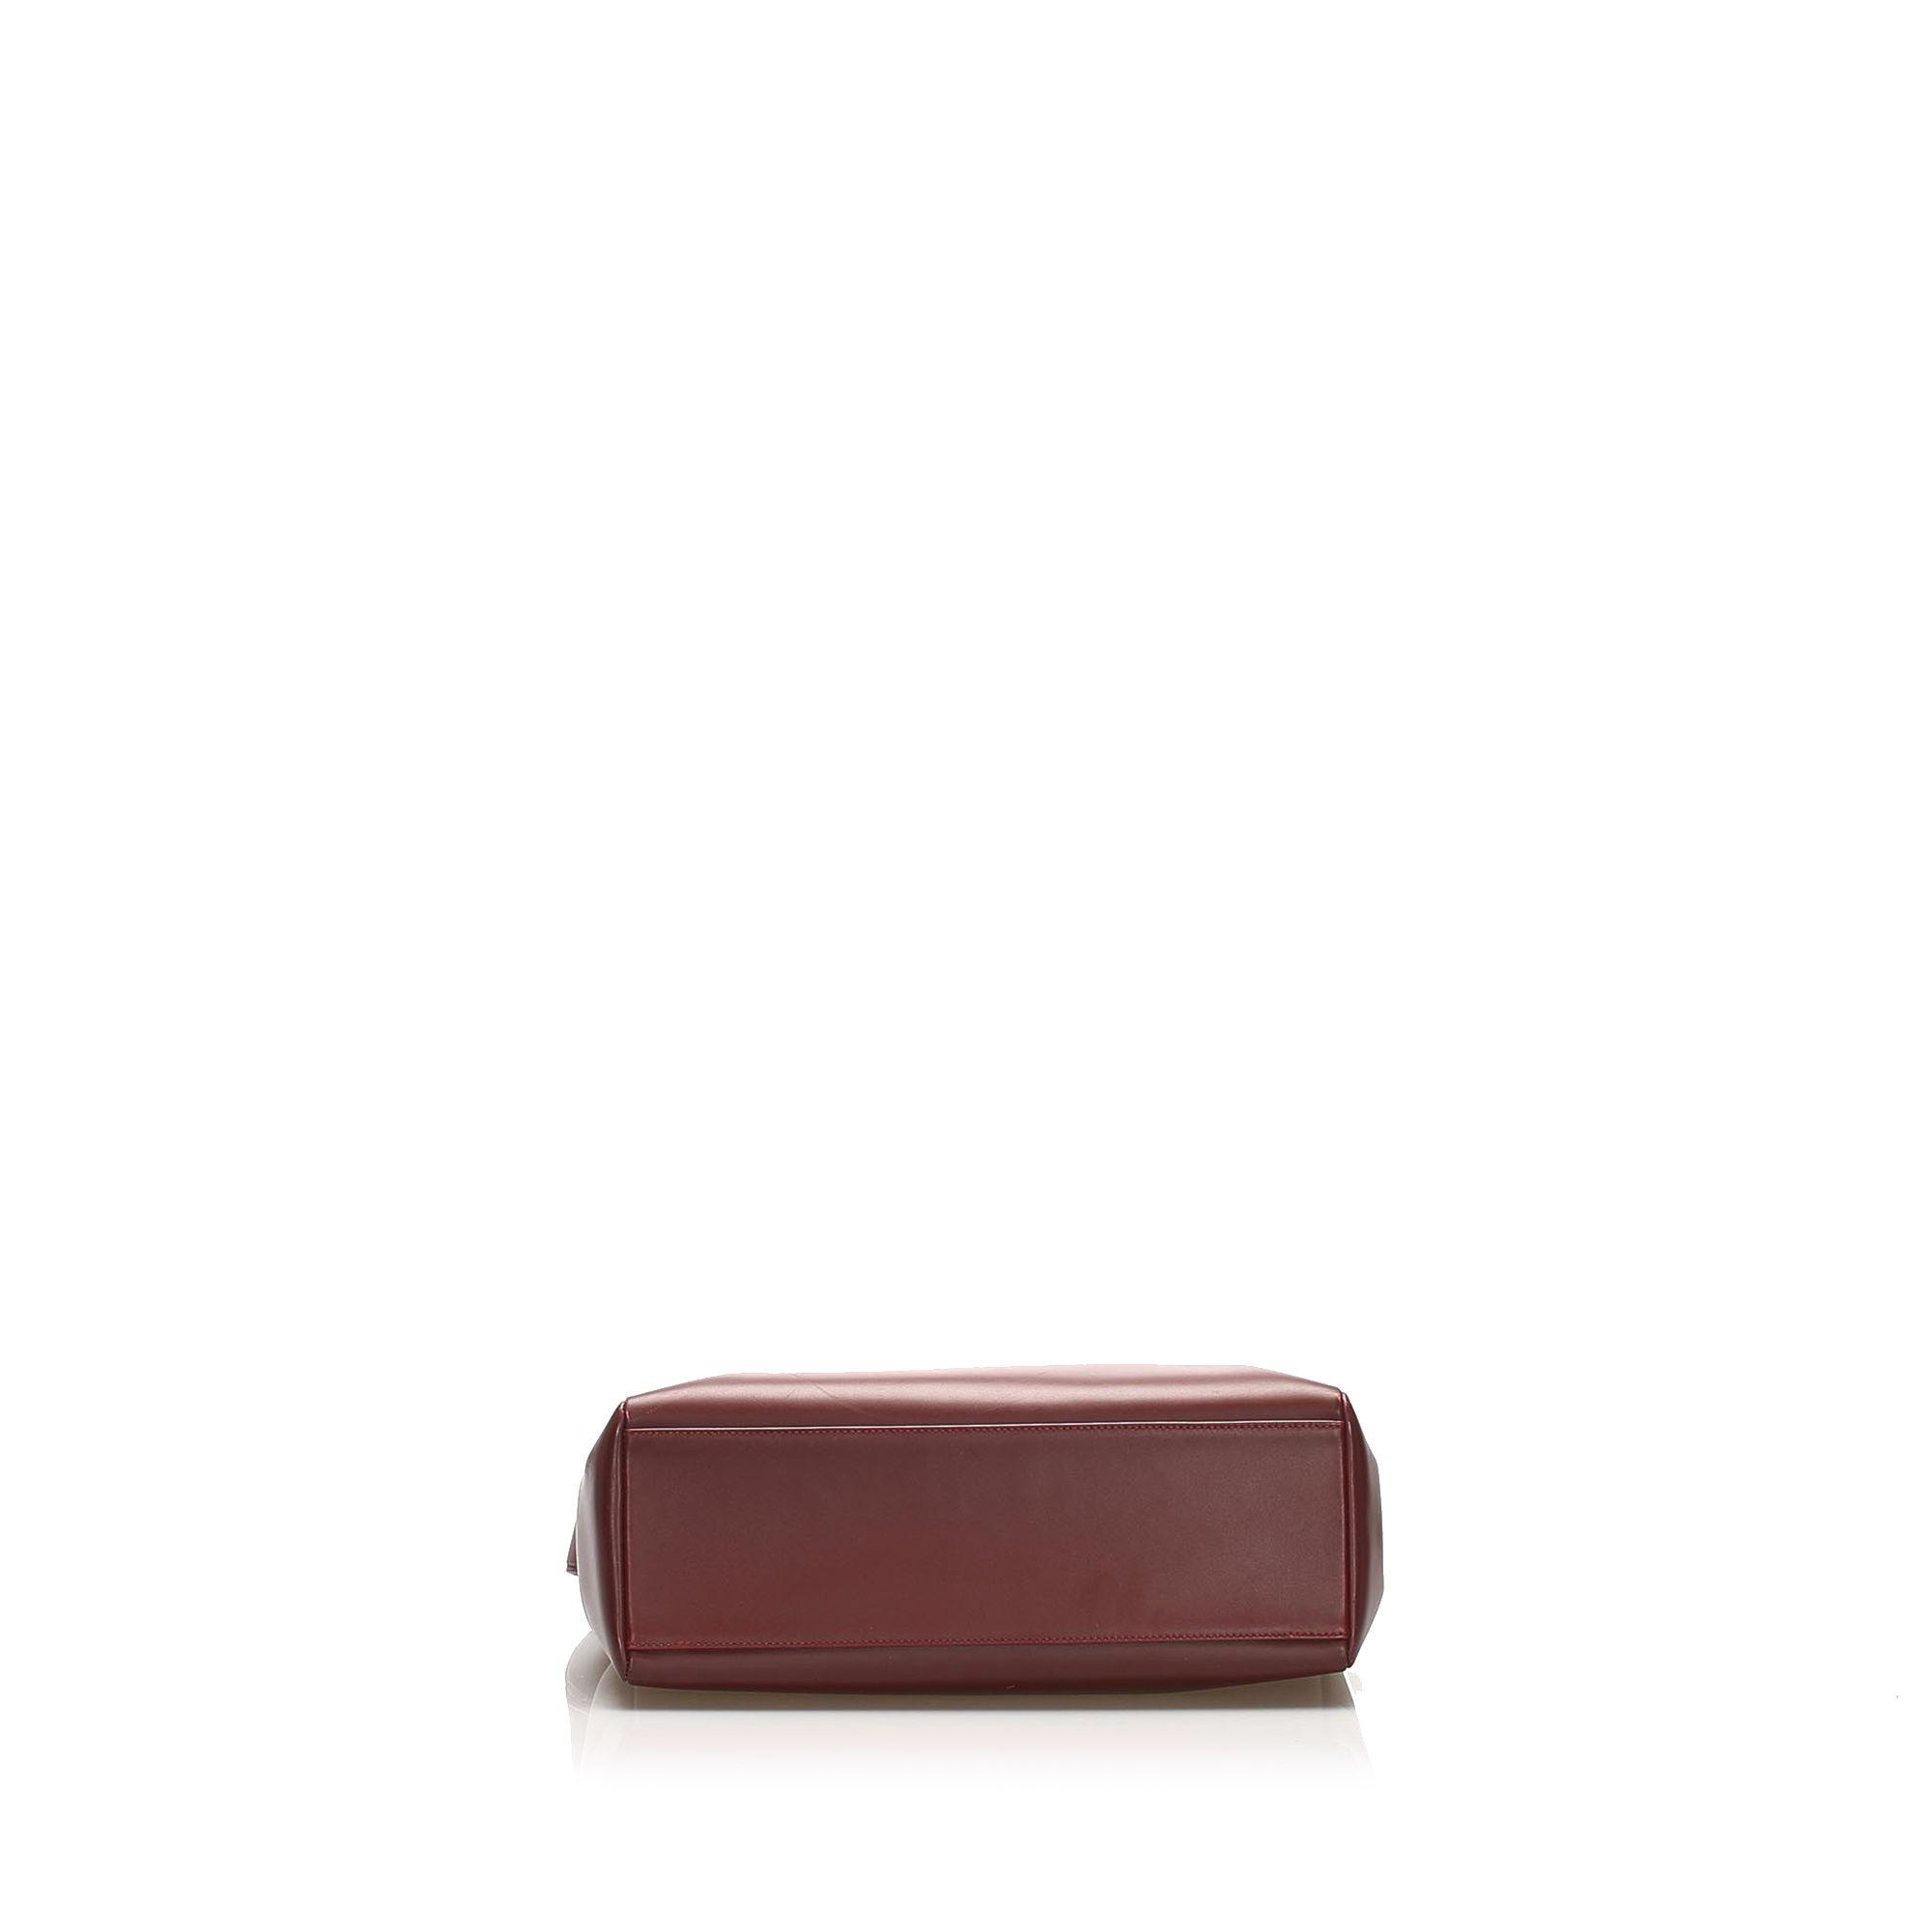 Vintage Cartier Must de Cartier Leather Shoulder Bag Red